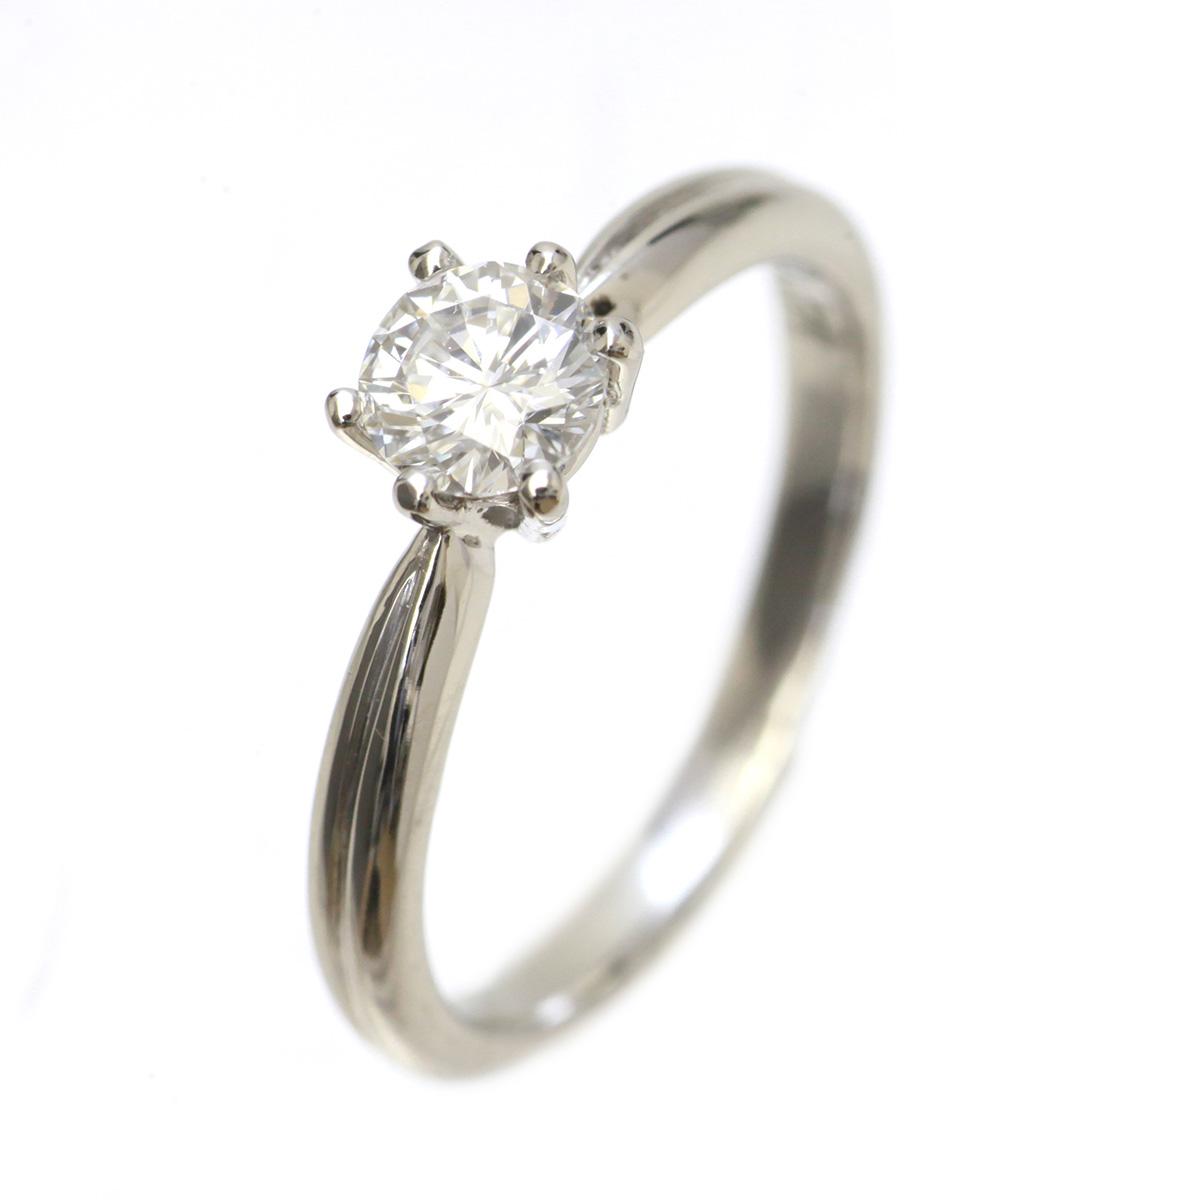 Pt900 立爪ダイヤリング 6号 0.31ct 2.6g ついに再販開始 030326CAH-12595 全国送料無料 中古 店舗